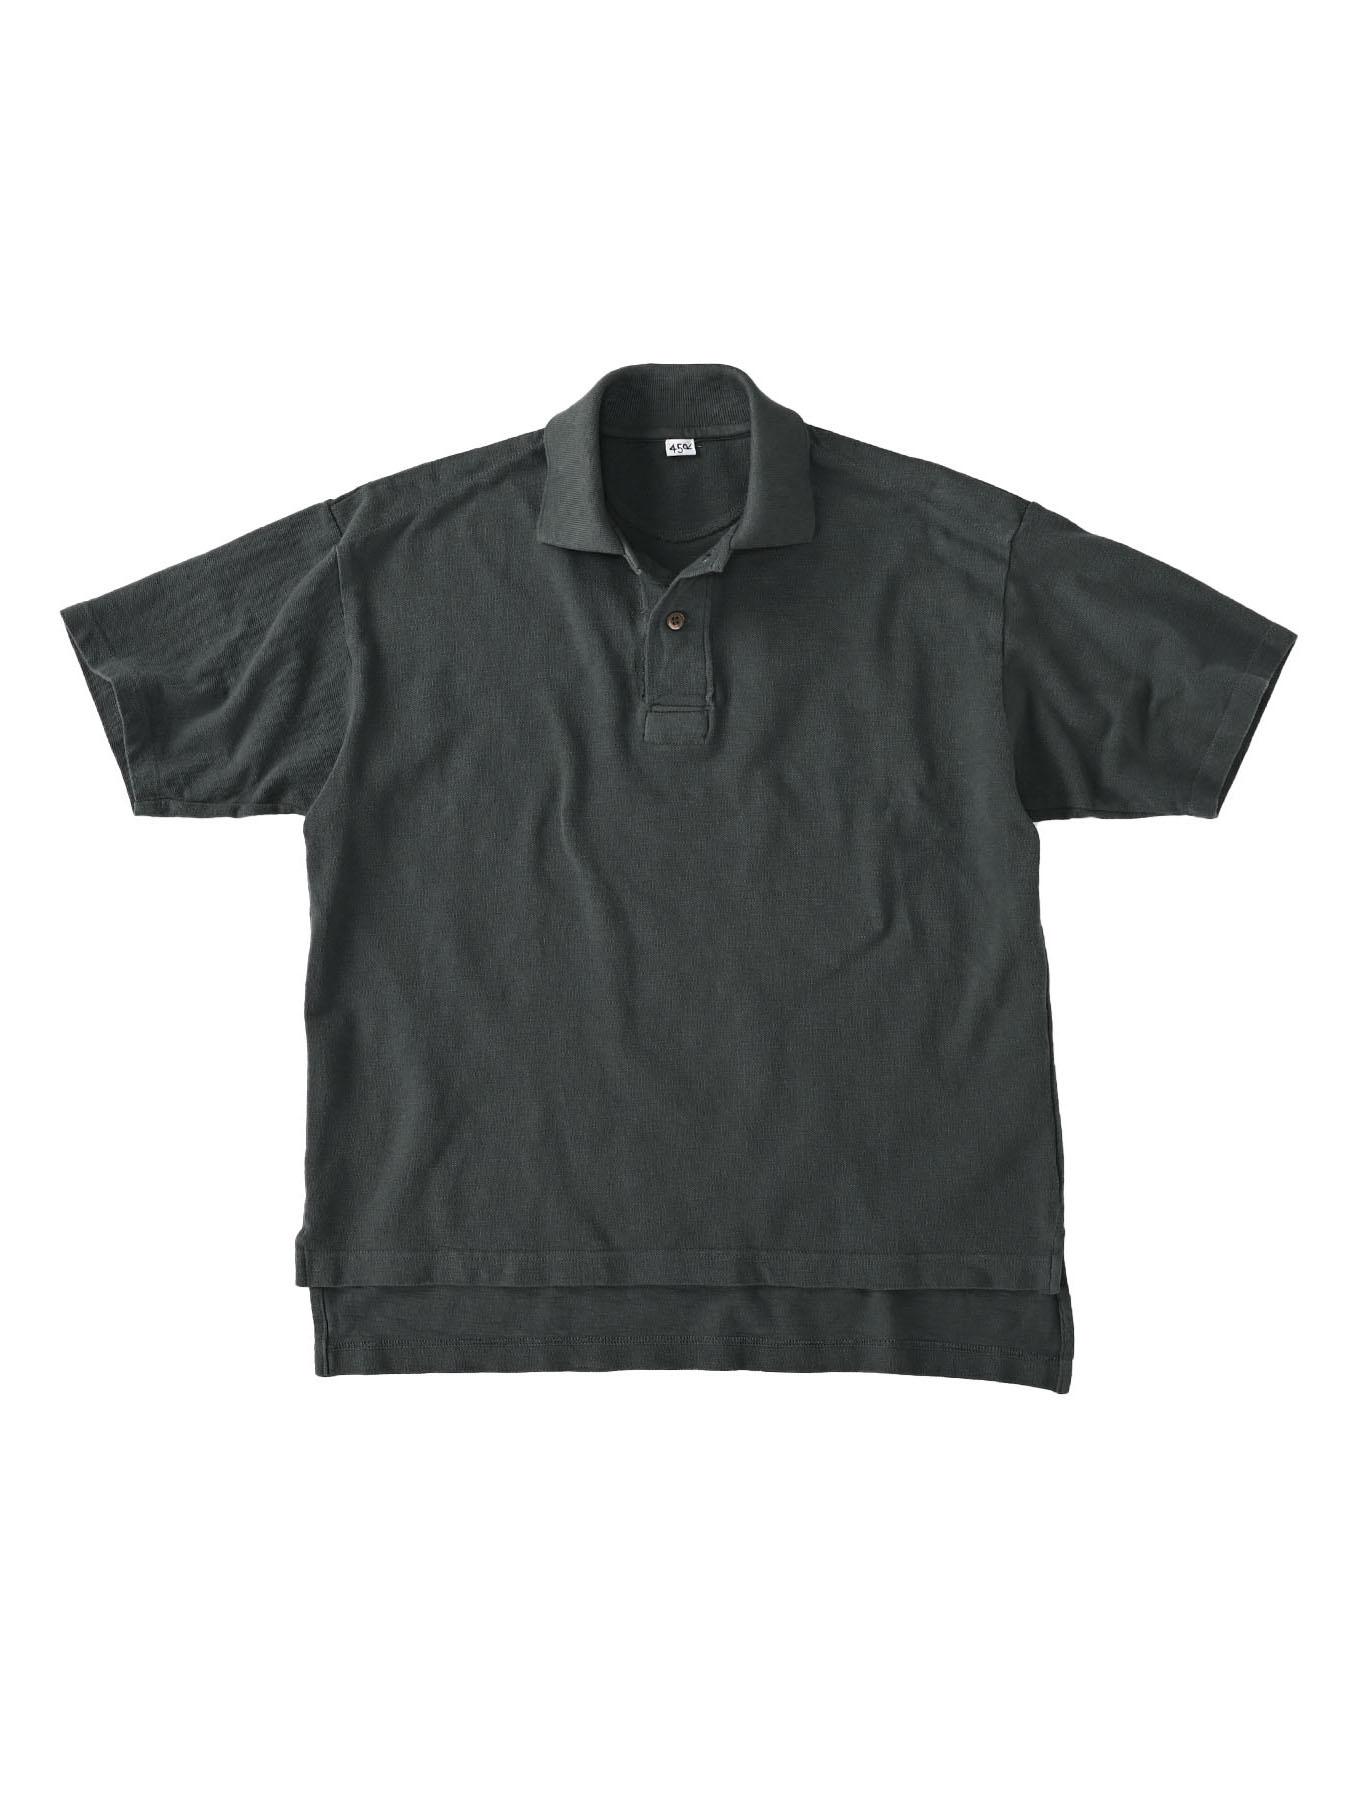 Kanoko Ocean Shiokaze Short-sleeved Polo Shirt (0521)-1